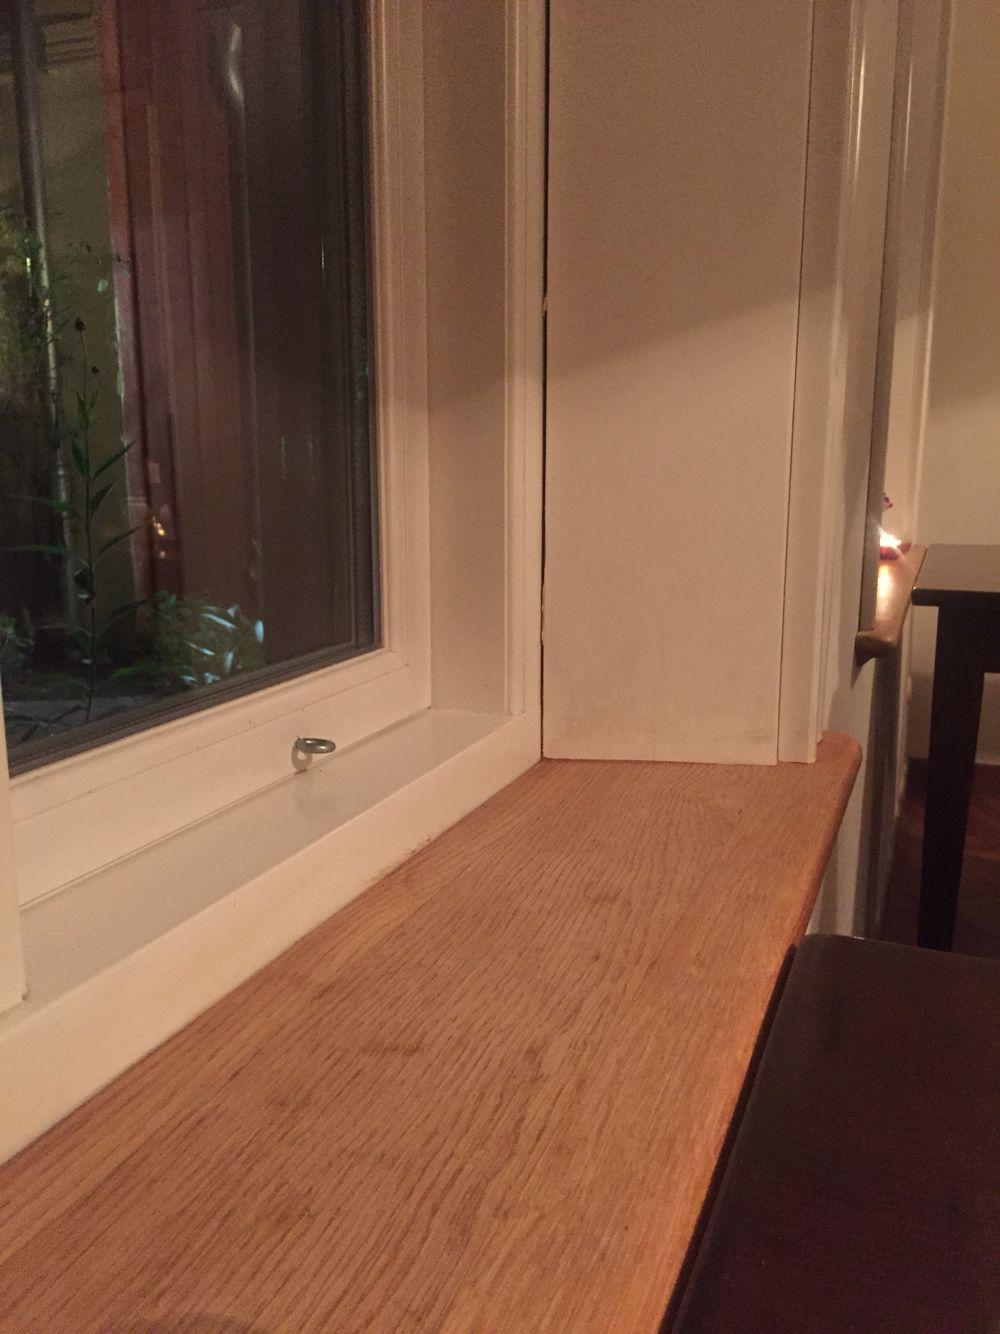 Fensterbänke aus unlackiertem Holz.   house   Pinterest ...